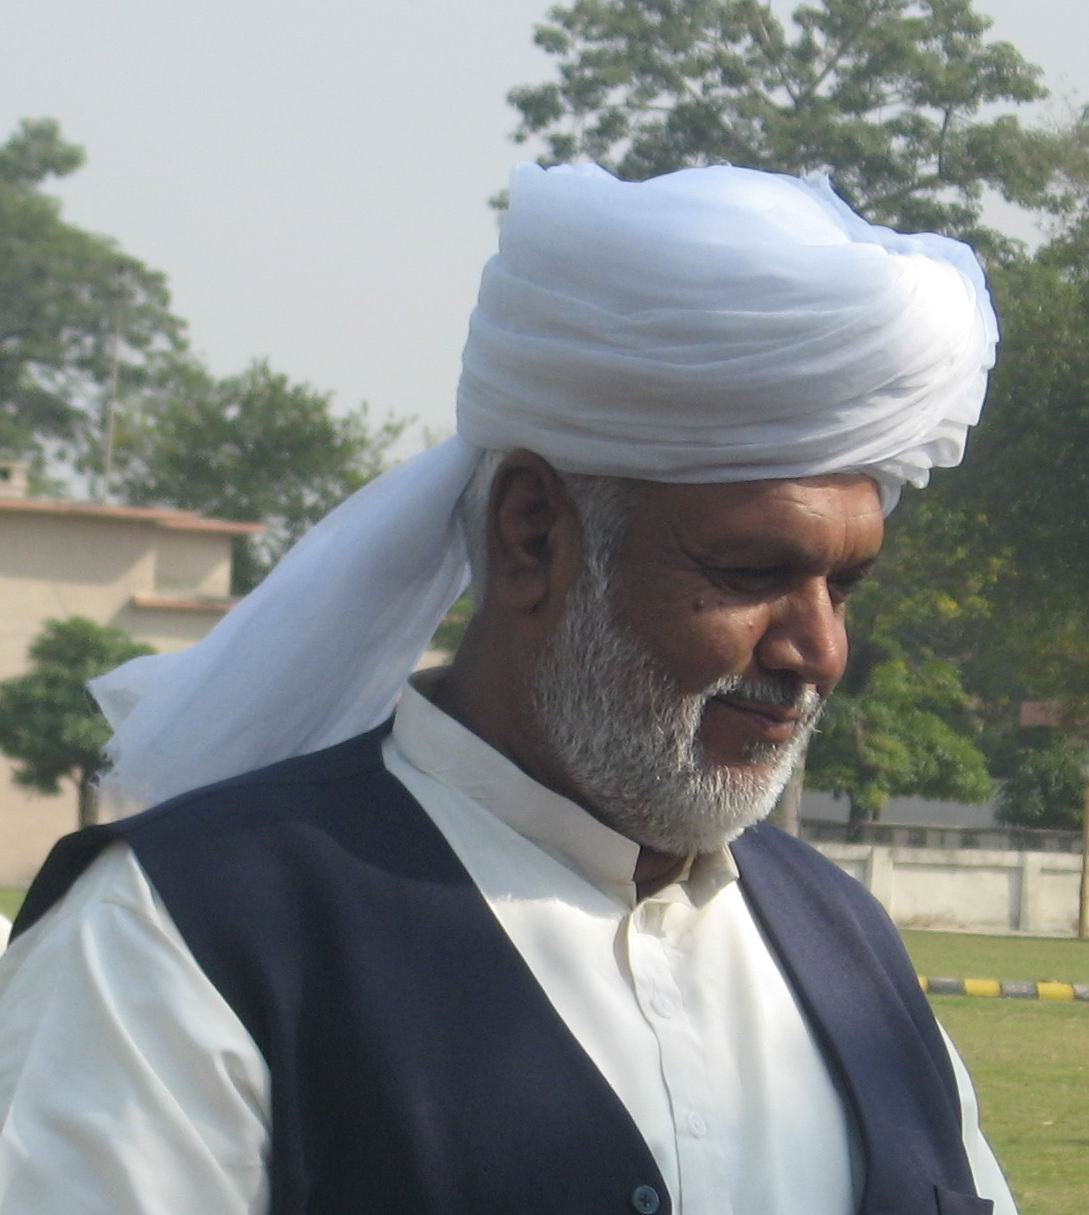 Waheed Ullah